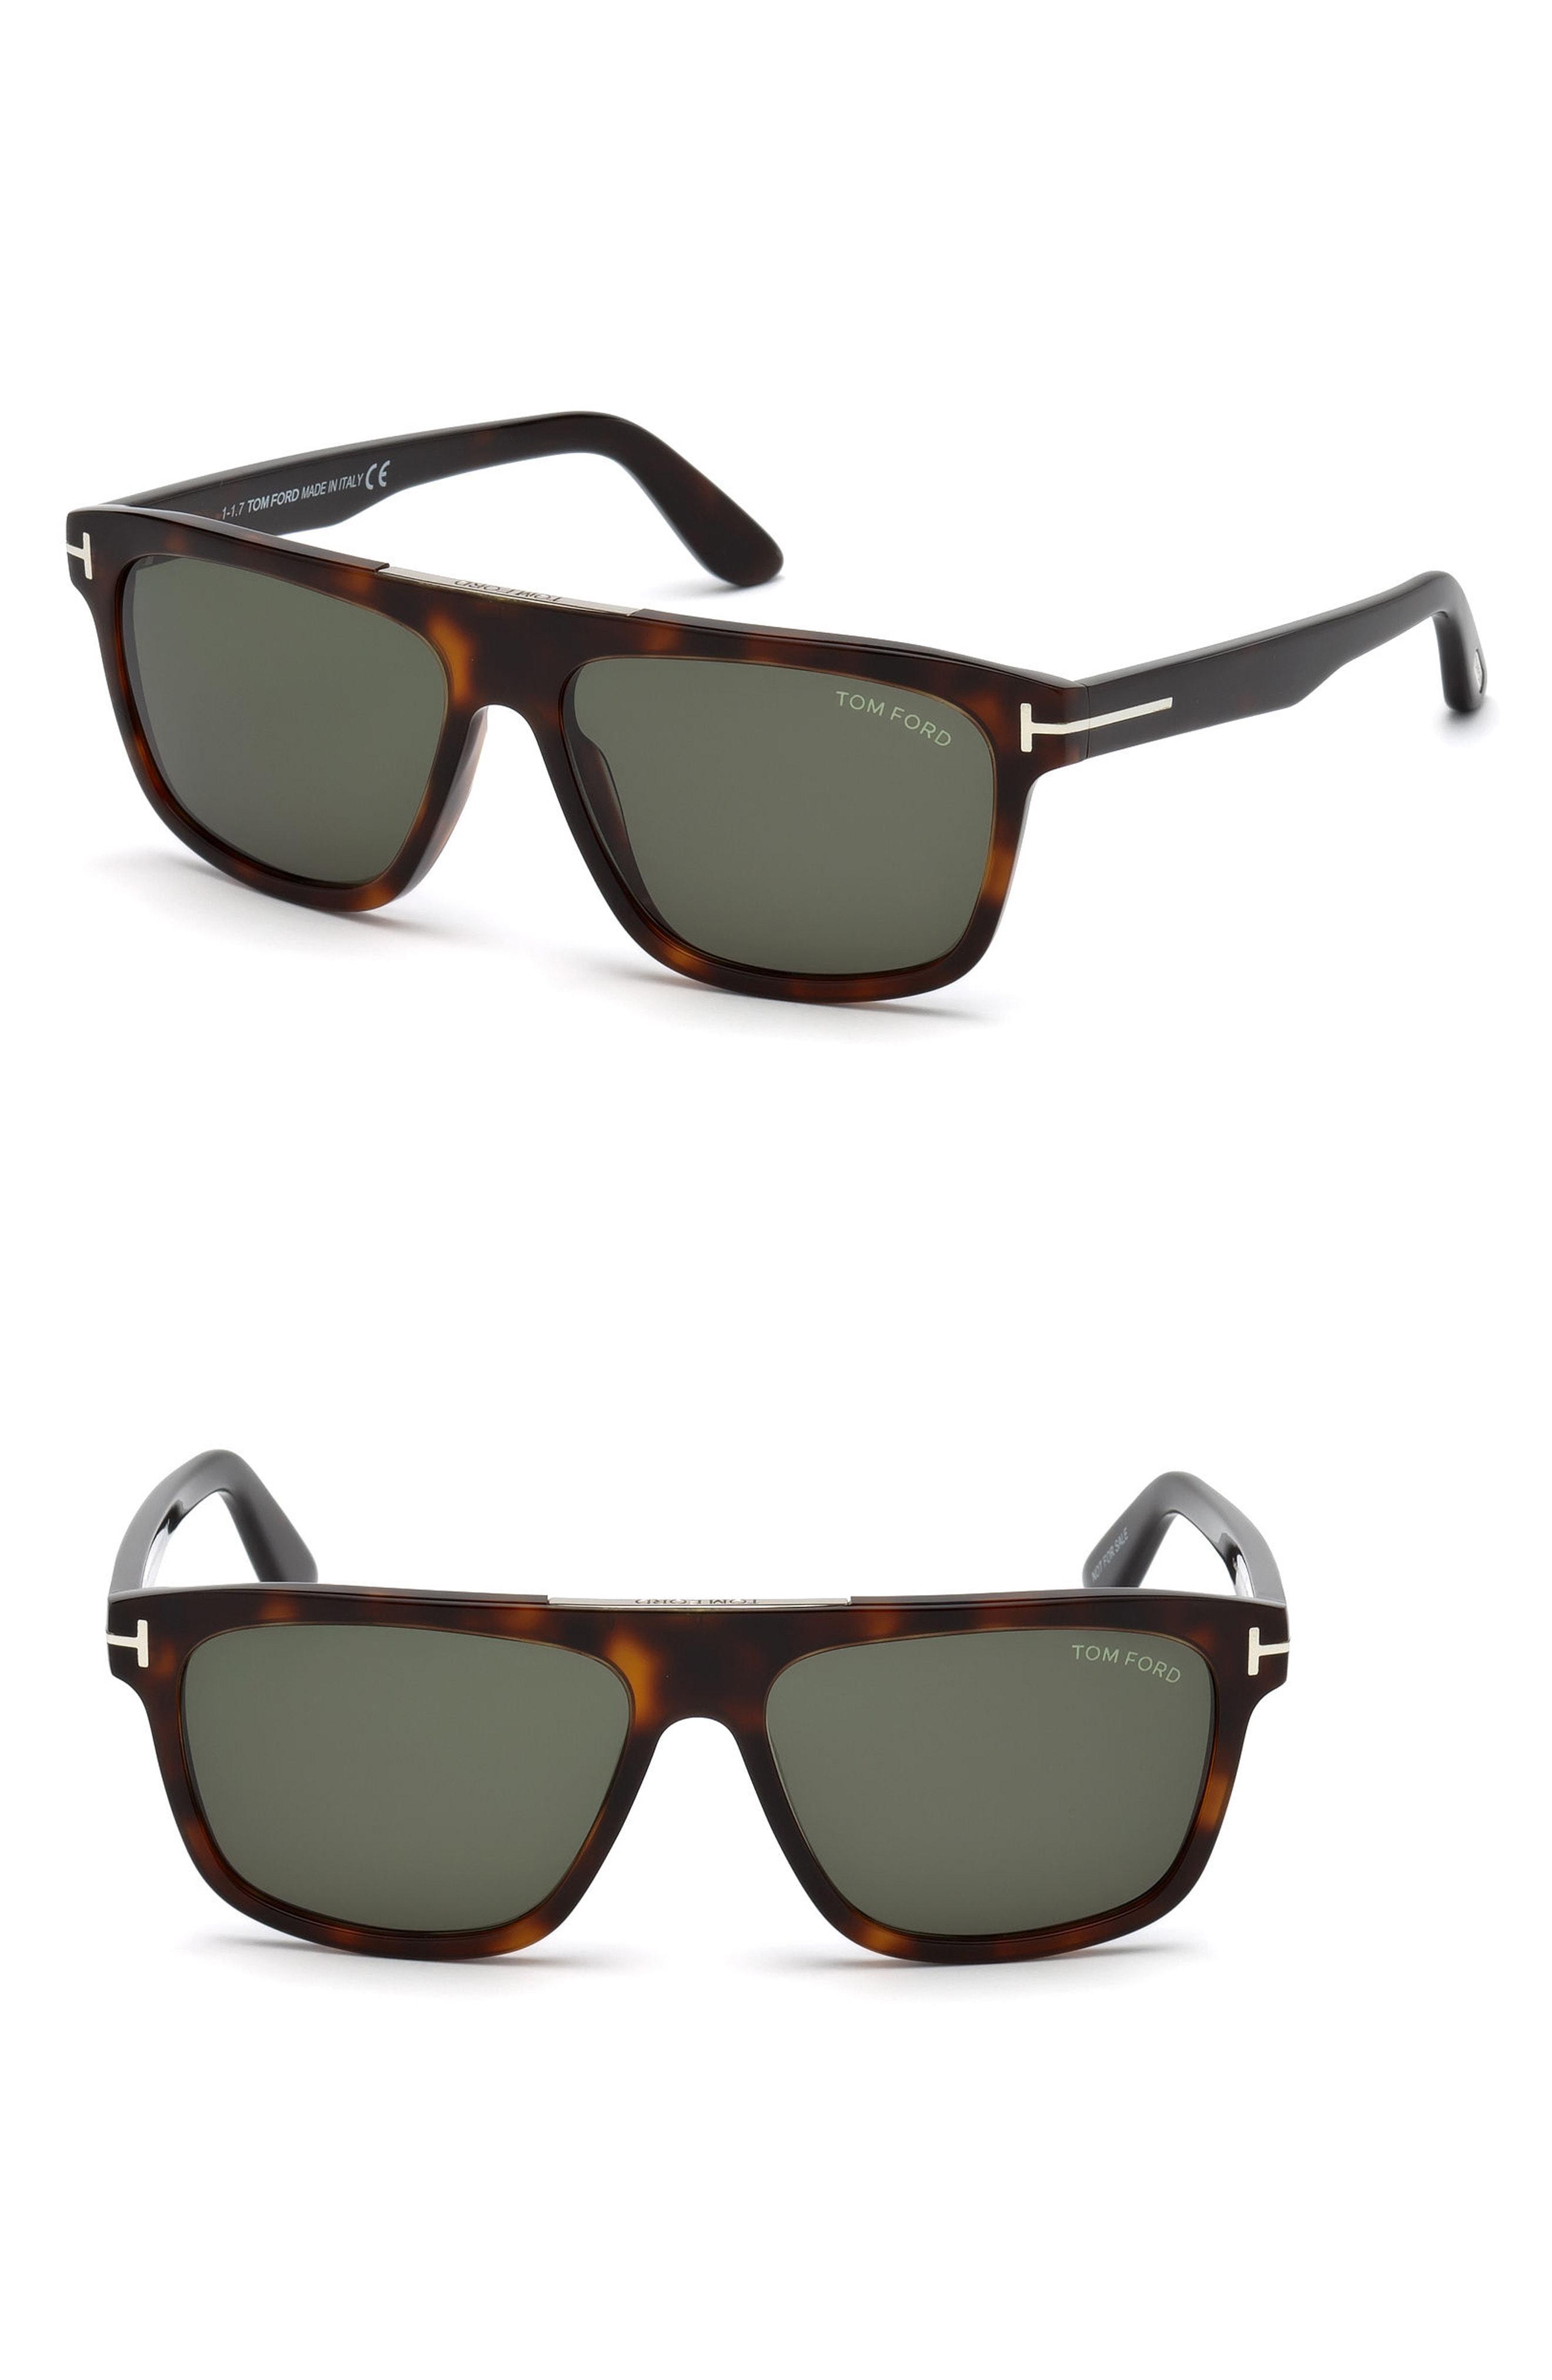 c4187984d2270 Tom Ford - Cecilio 57mm Sunglasses - Dark Havana   Green for Men - Lyst.  View fullscreen